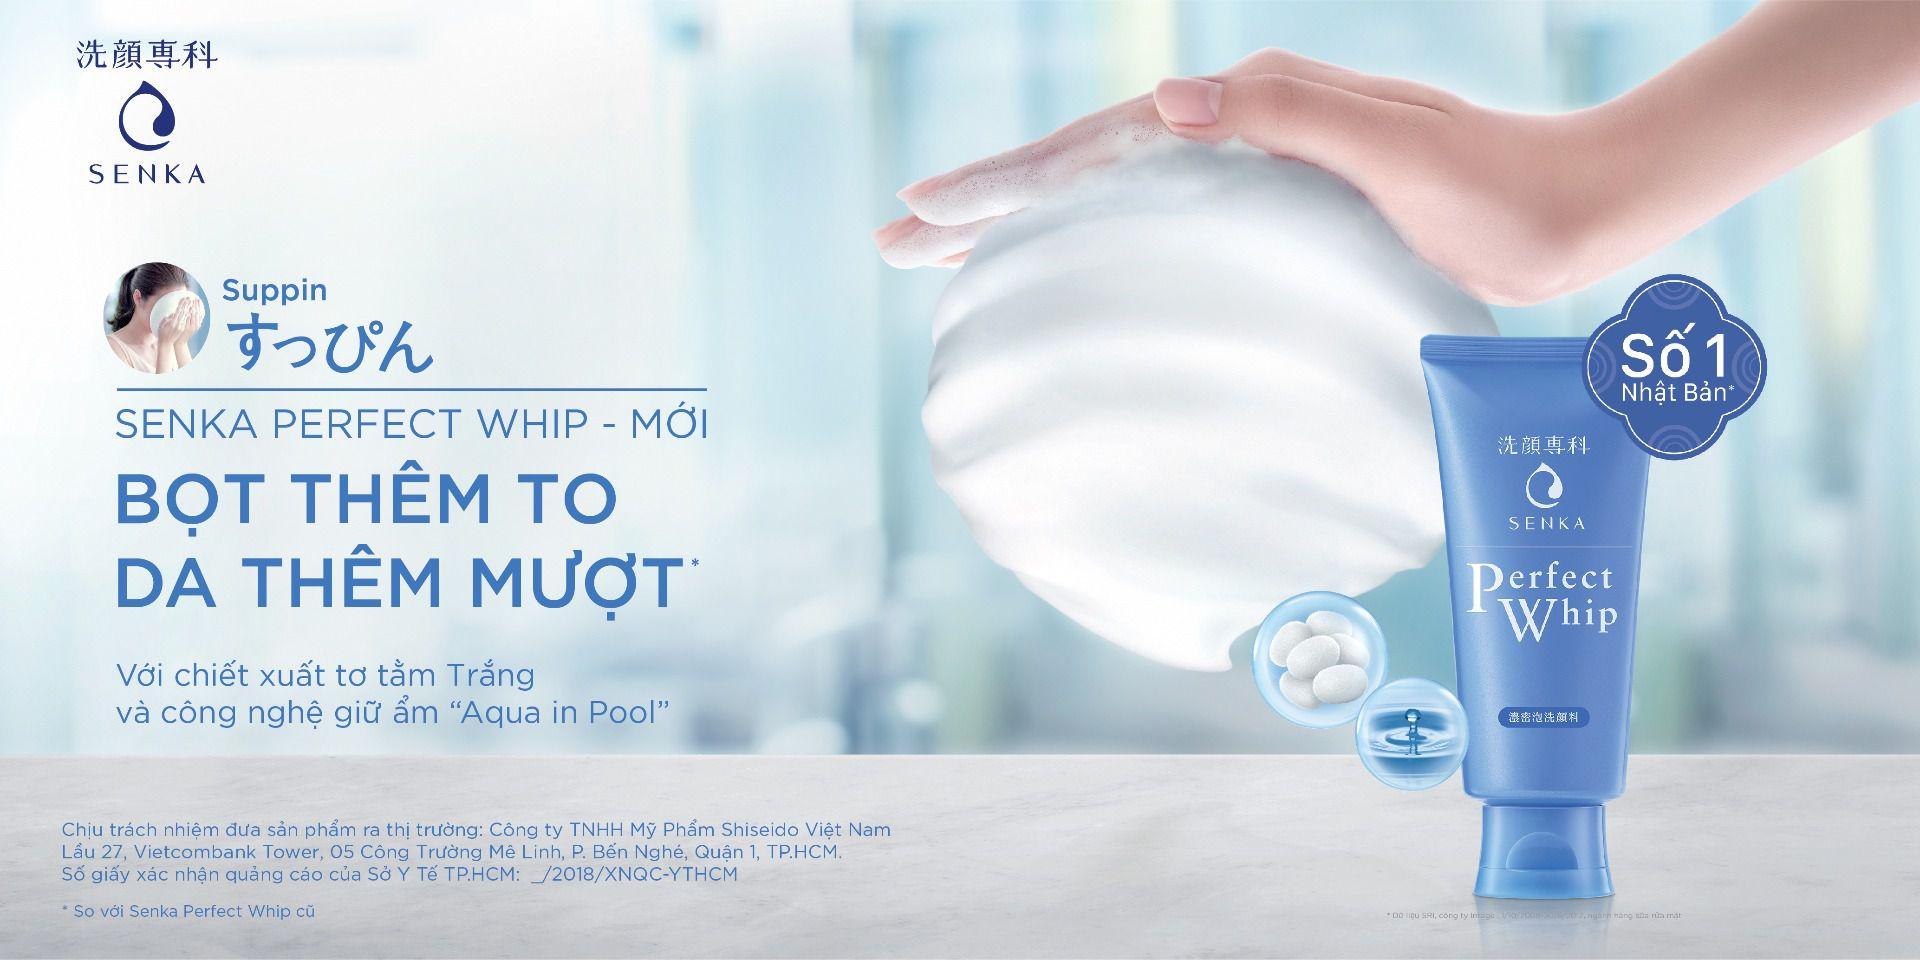 Sữa rửa mặt cho da hỗn hợp thiên dầu Shiseido 1